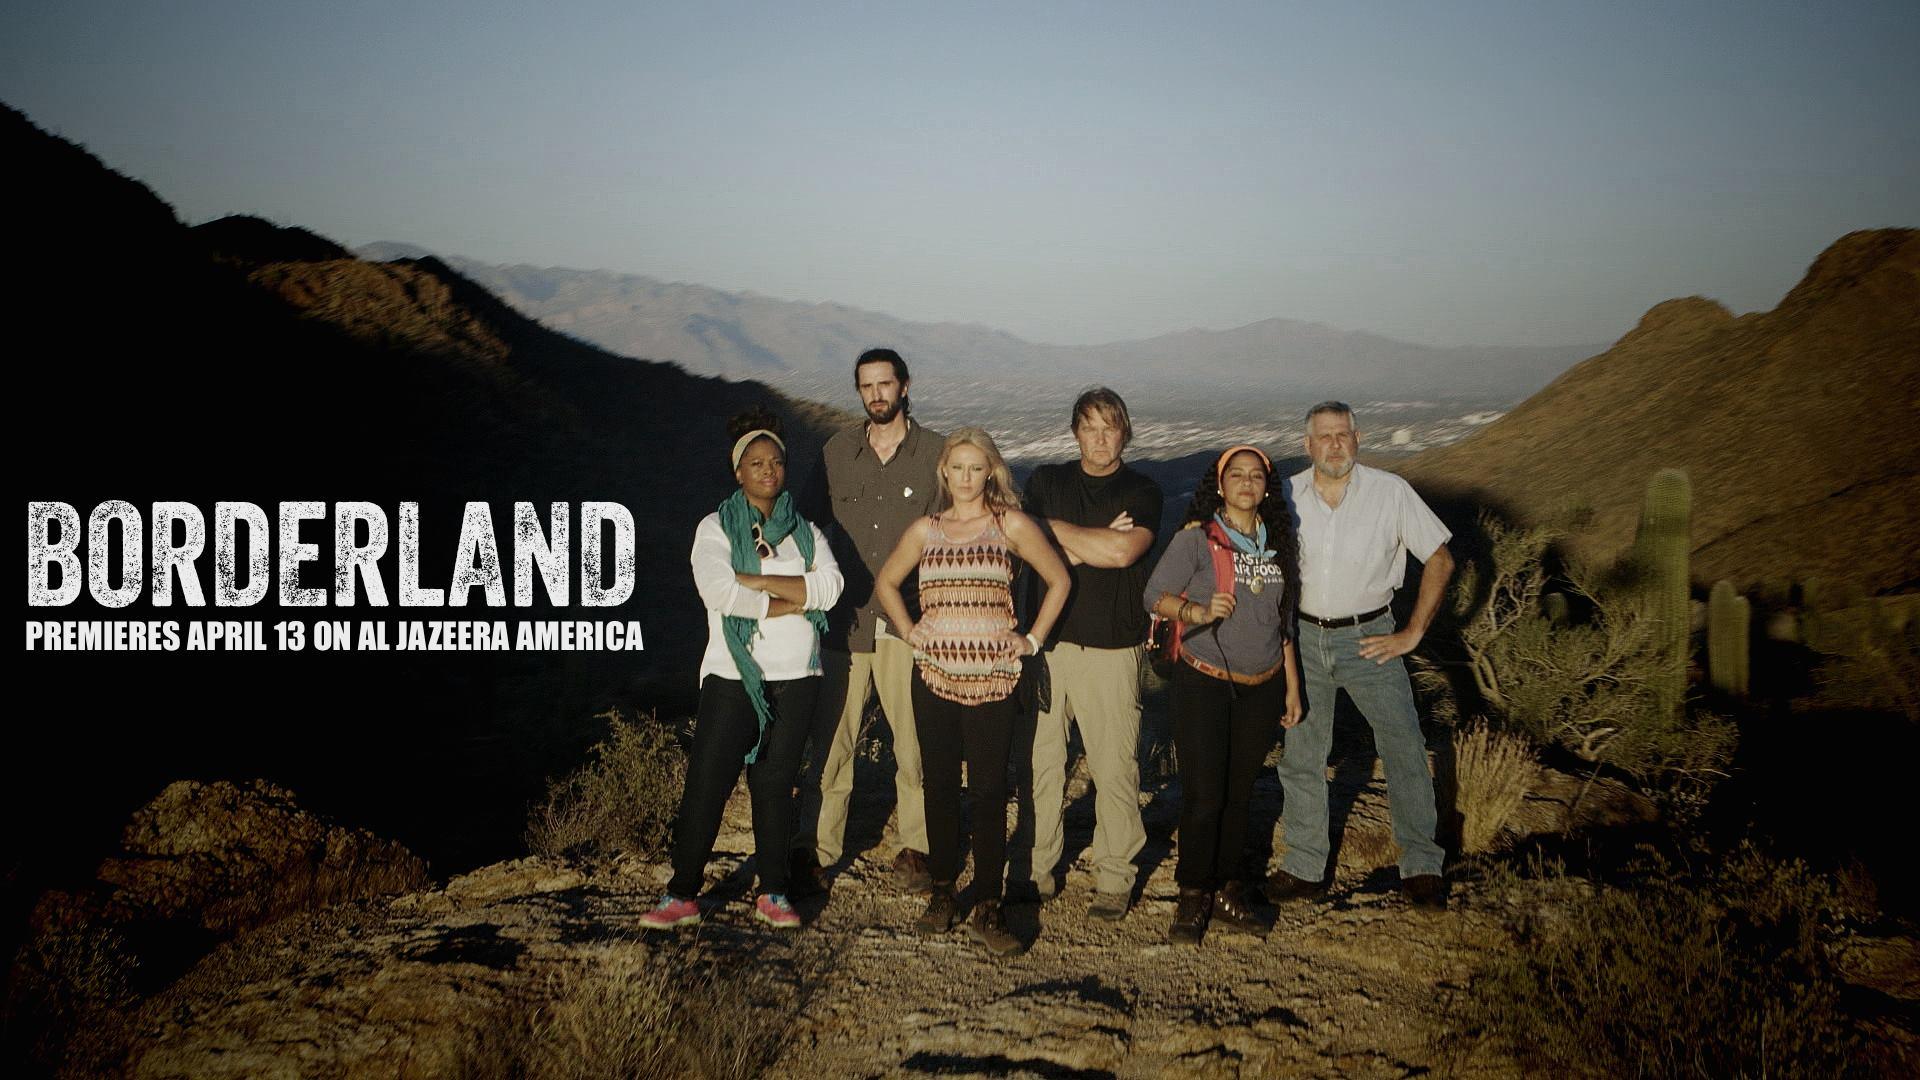 Niche Parent Community Joins together to discuss Al Jazeera America's Borderland